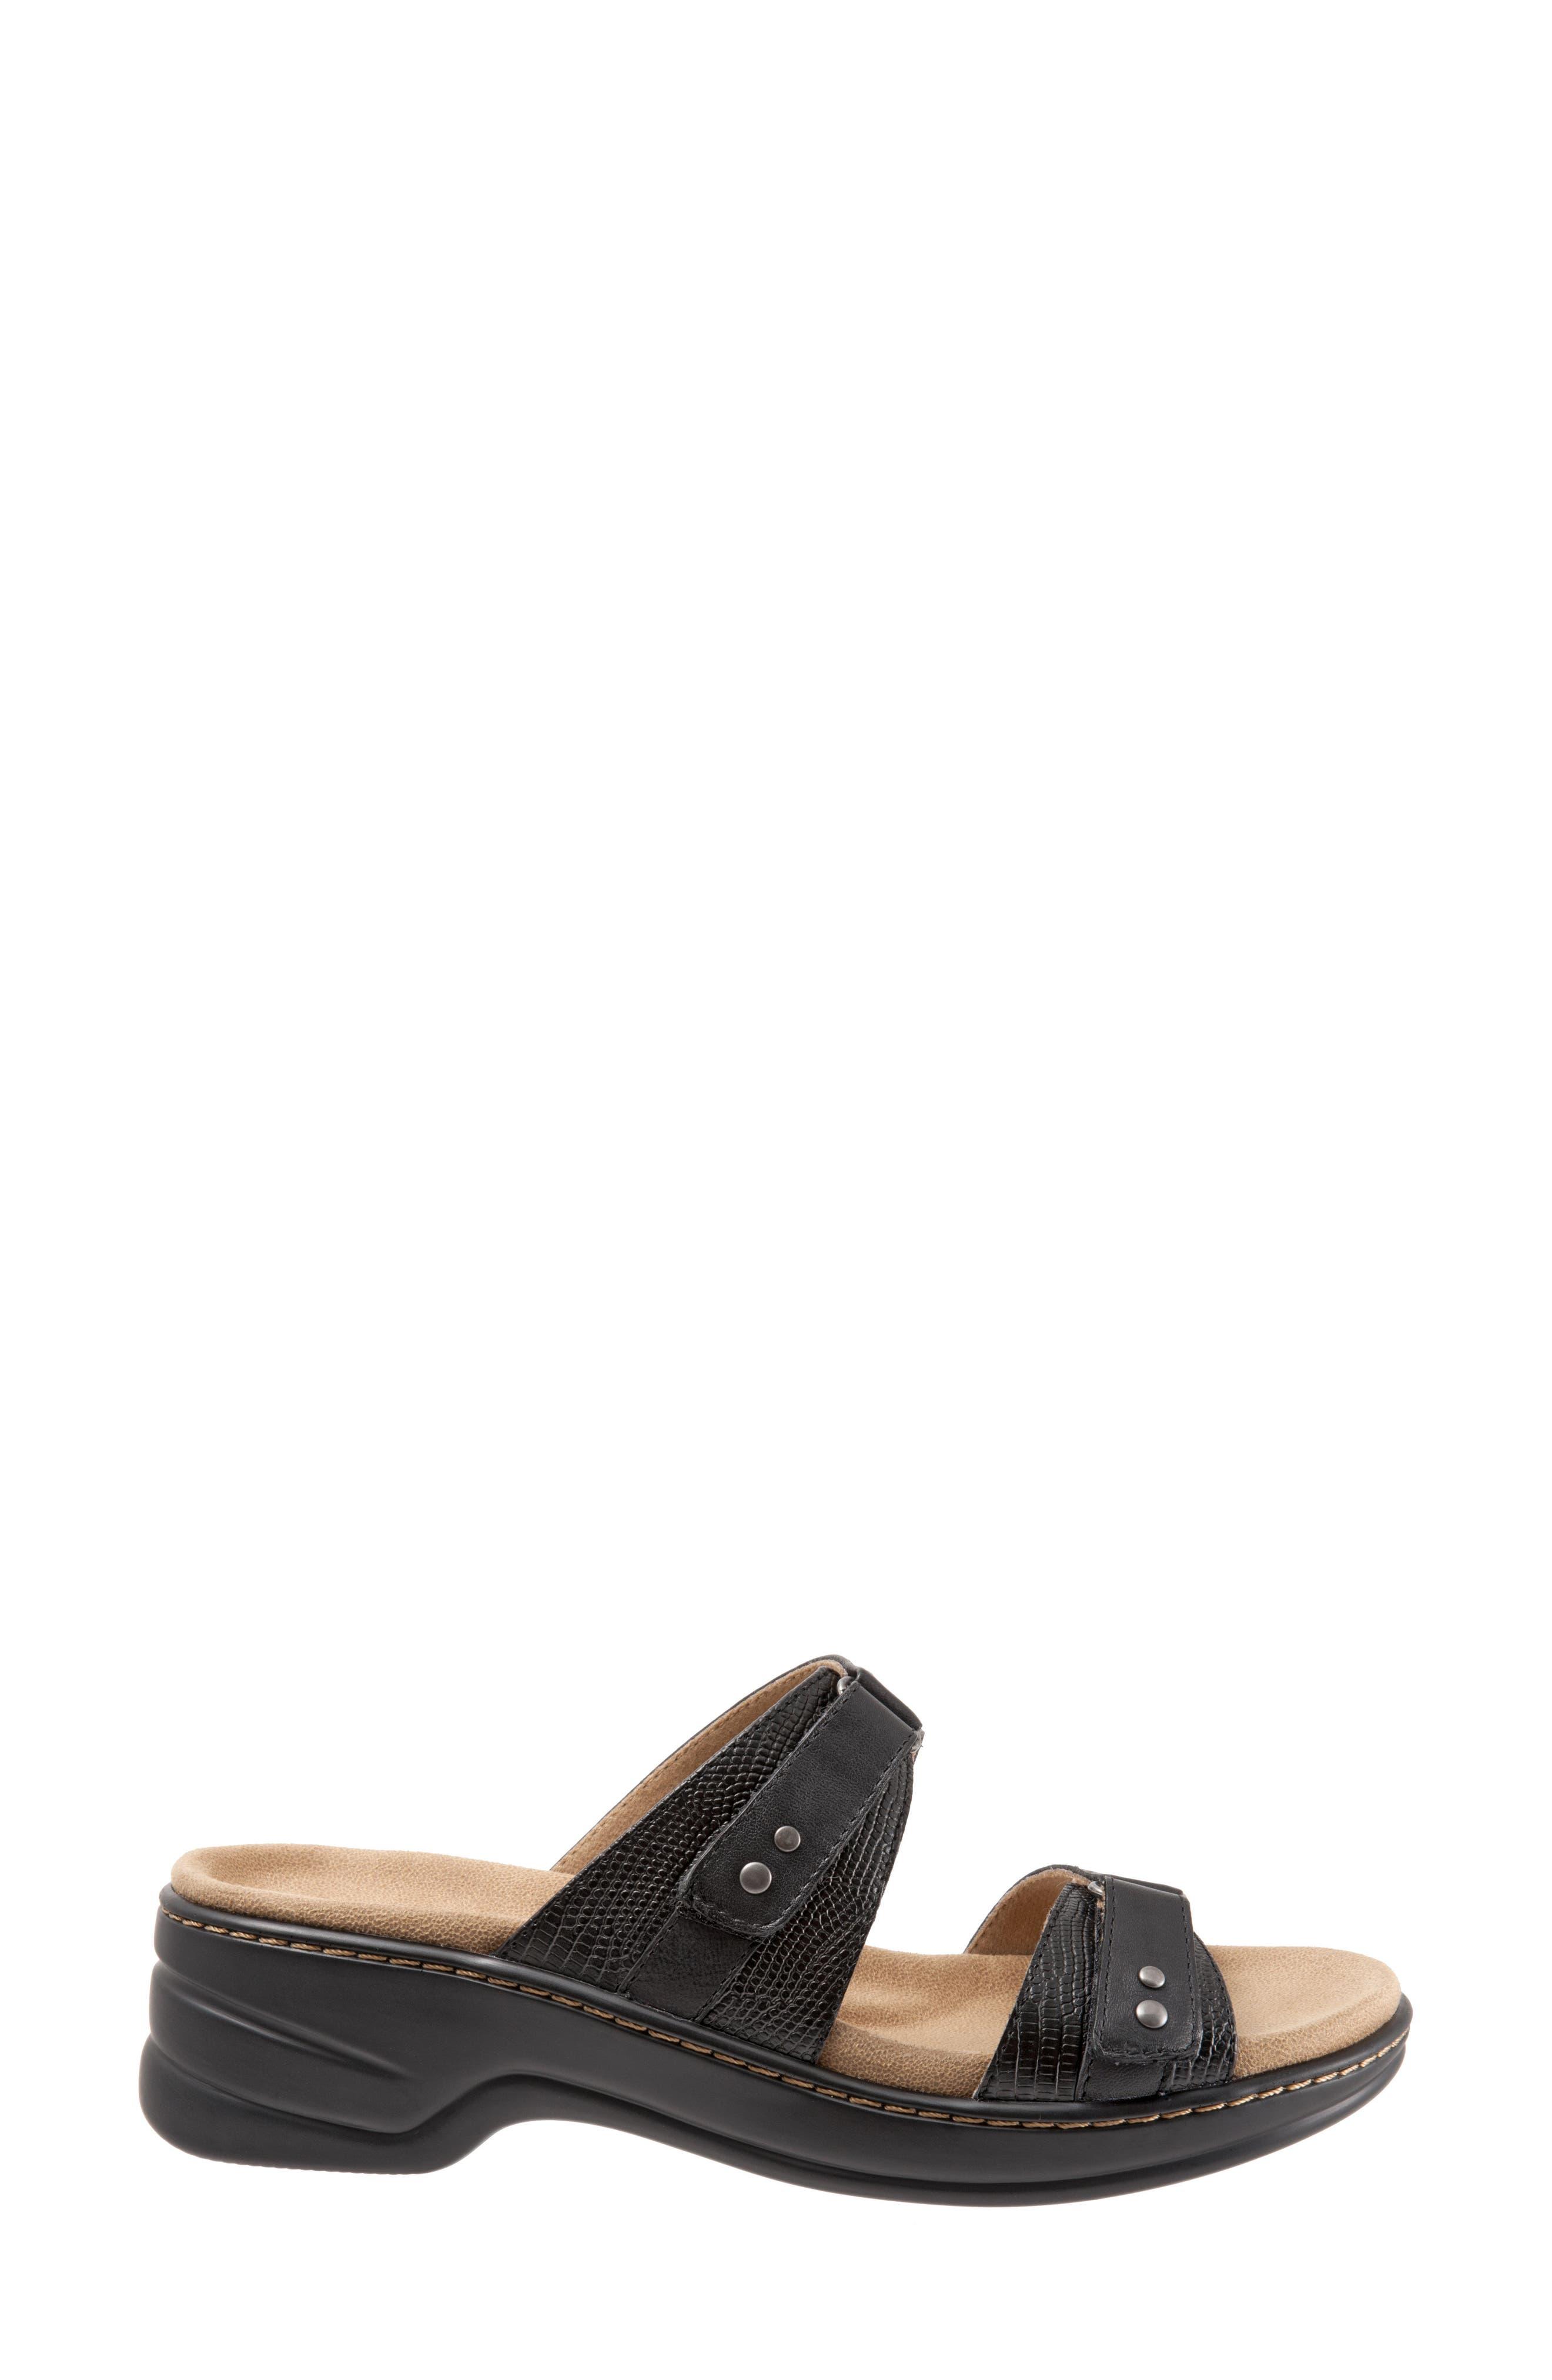 Neiman Sandal,                             Alternate thumbnail 3, color,                             Black Leather